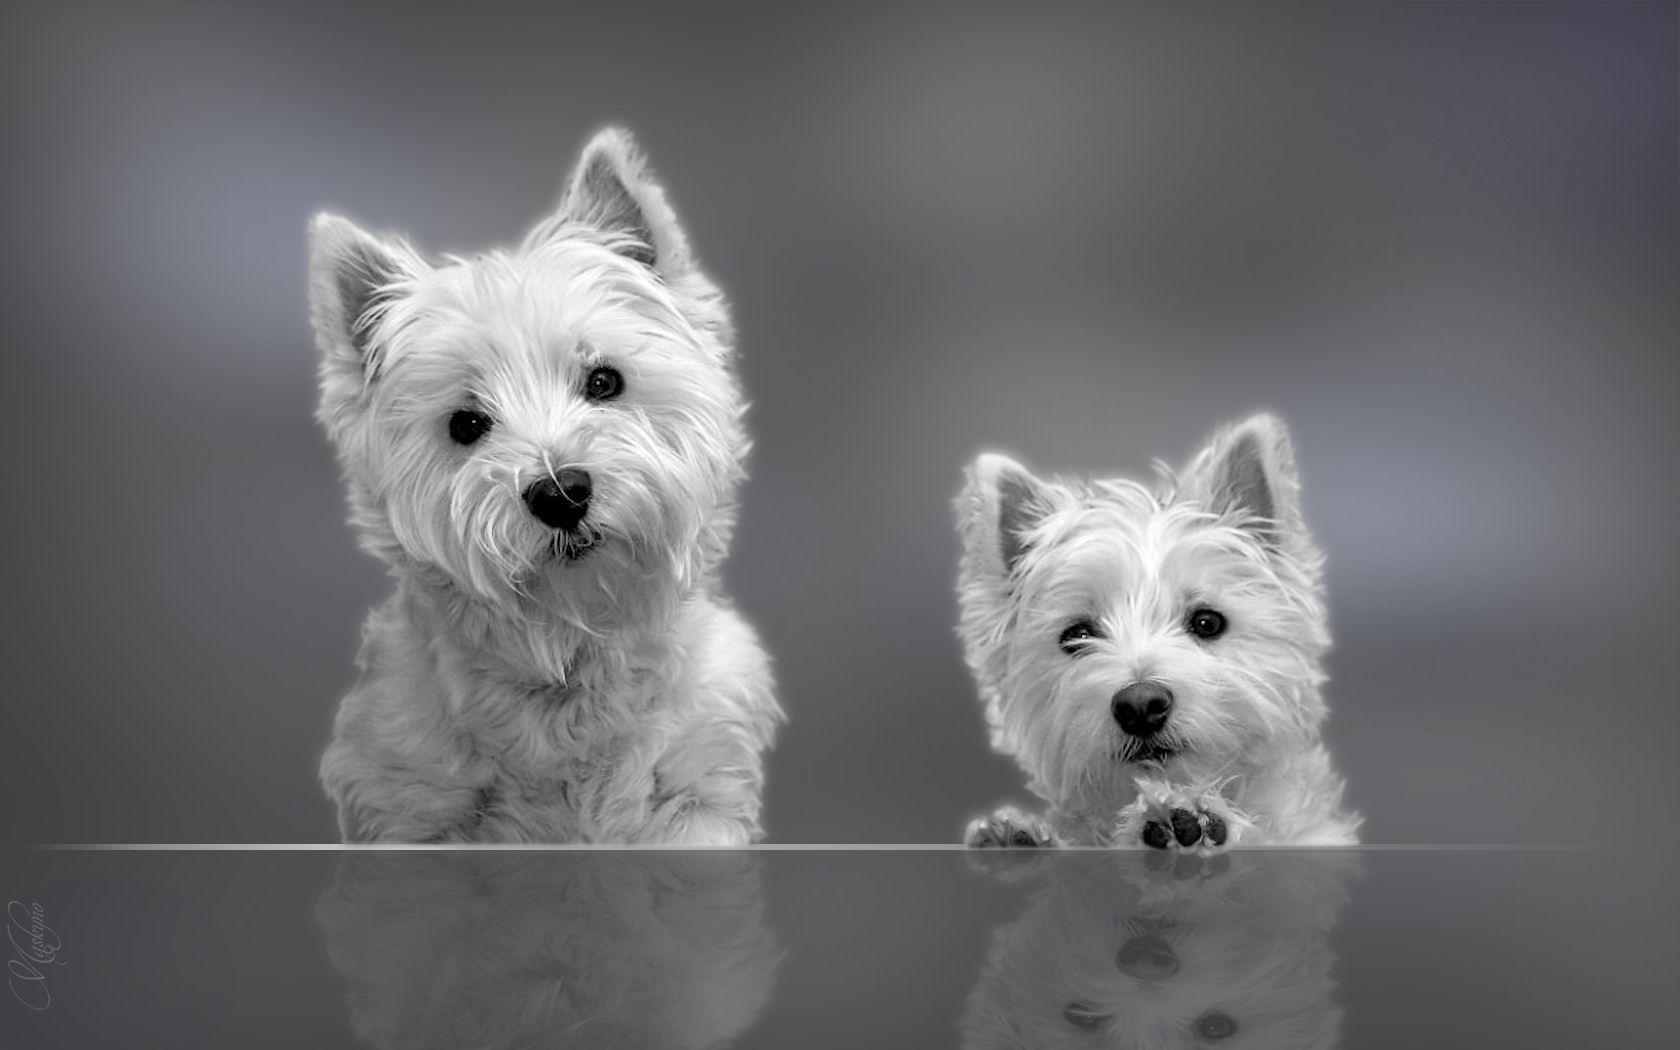 West Highland White Terrier Puppies Wallpaper WESTIES